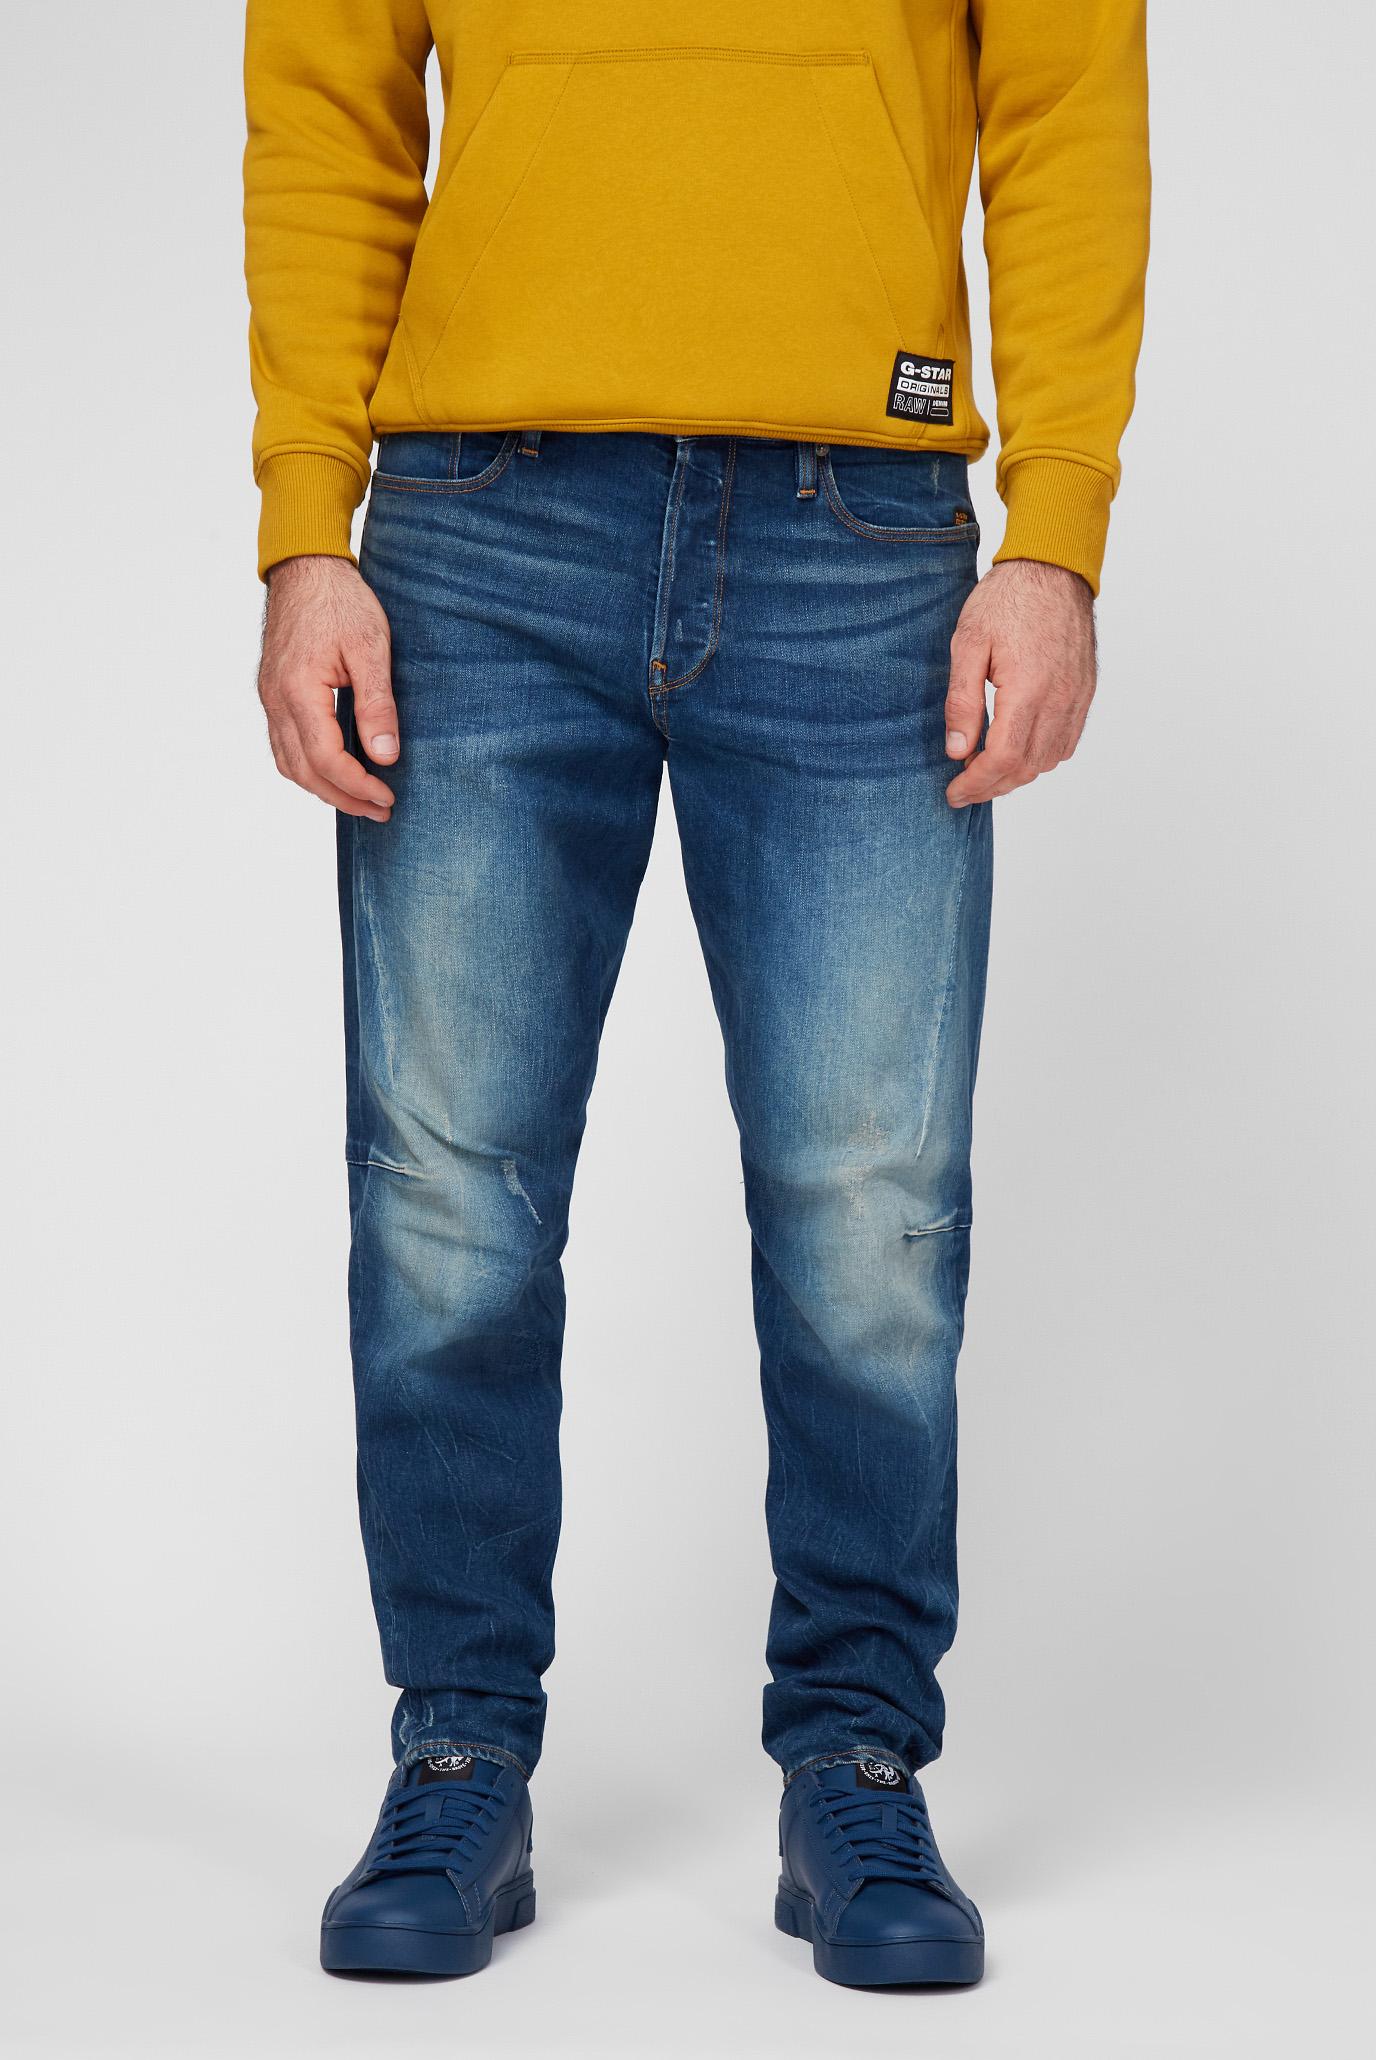 Мужские голубые джинсы Scutar 3D Slim Tapered 1